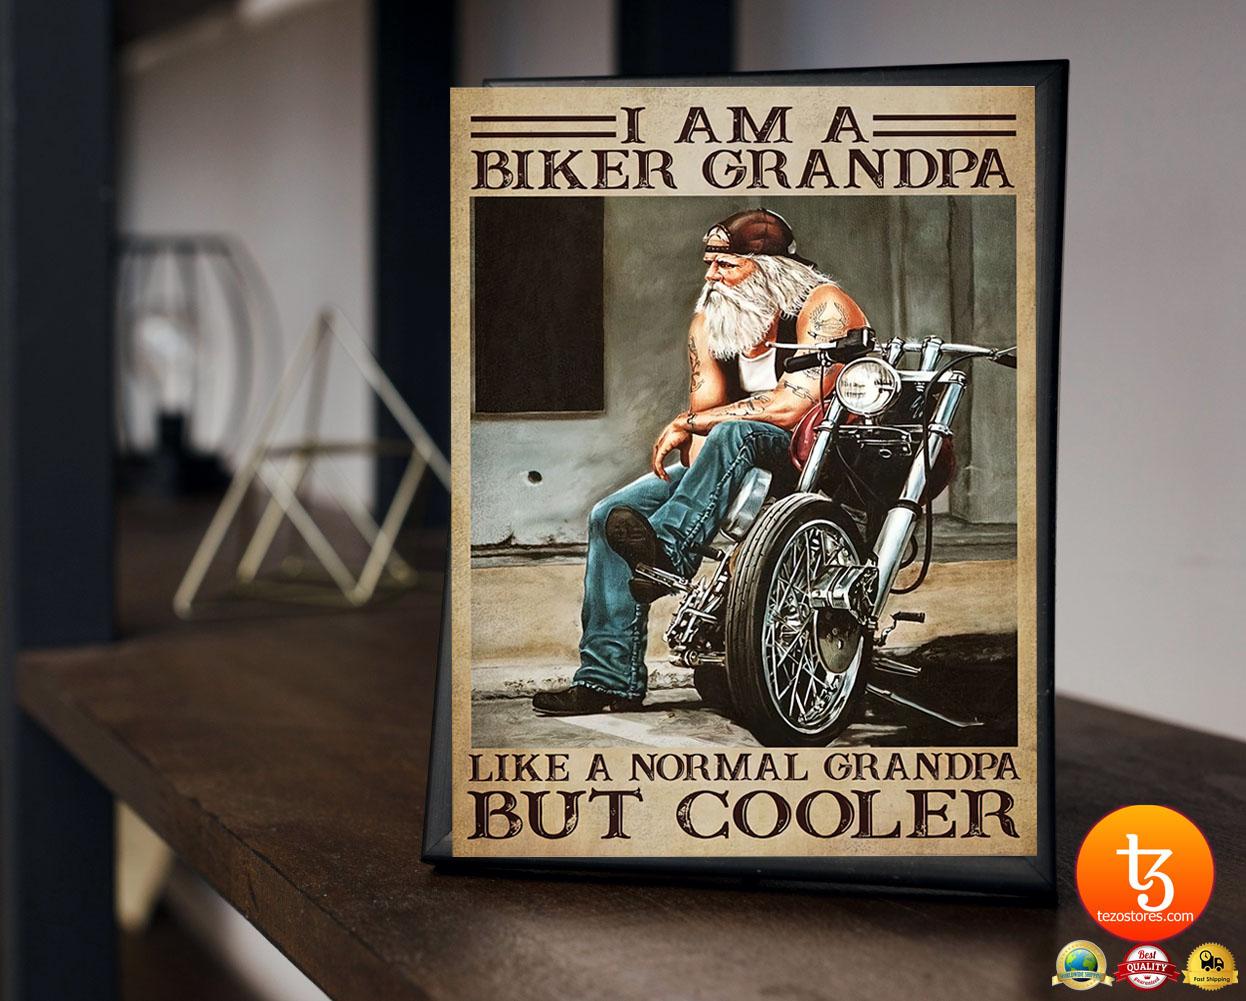 I am a biker grandpa like a normal grandpa but cooler poster 2